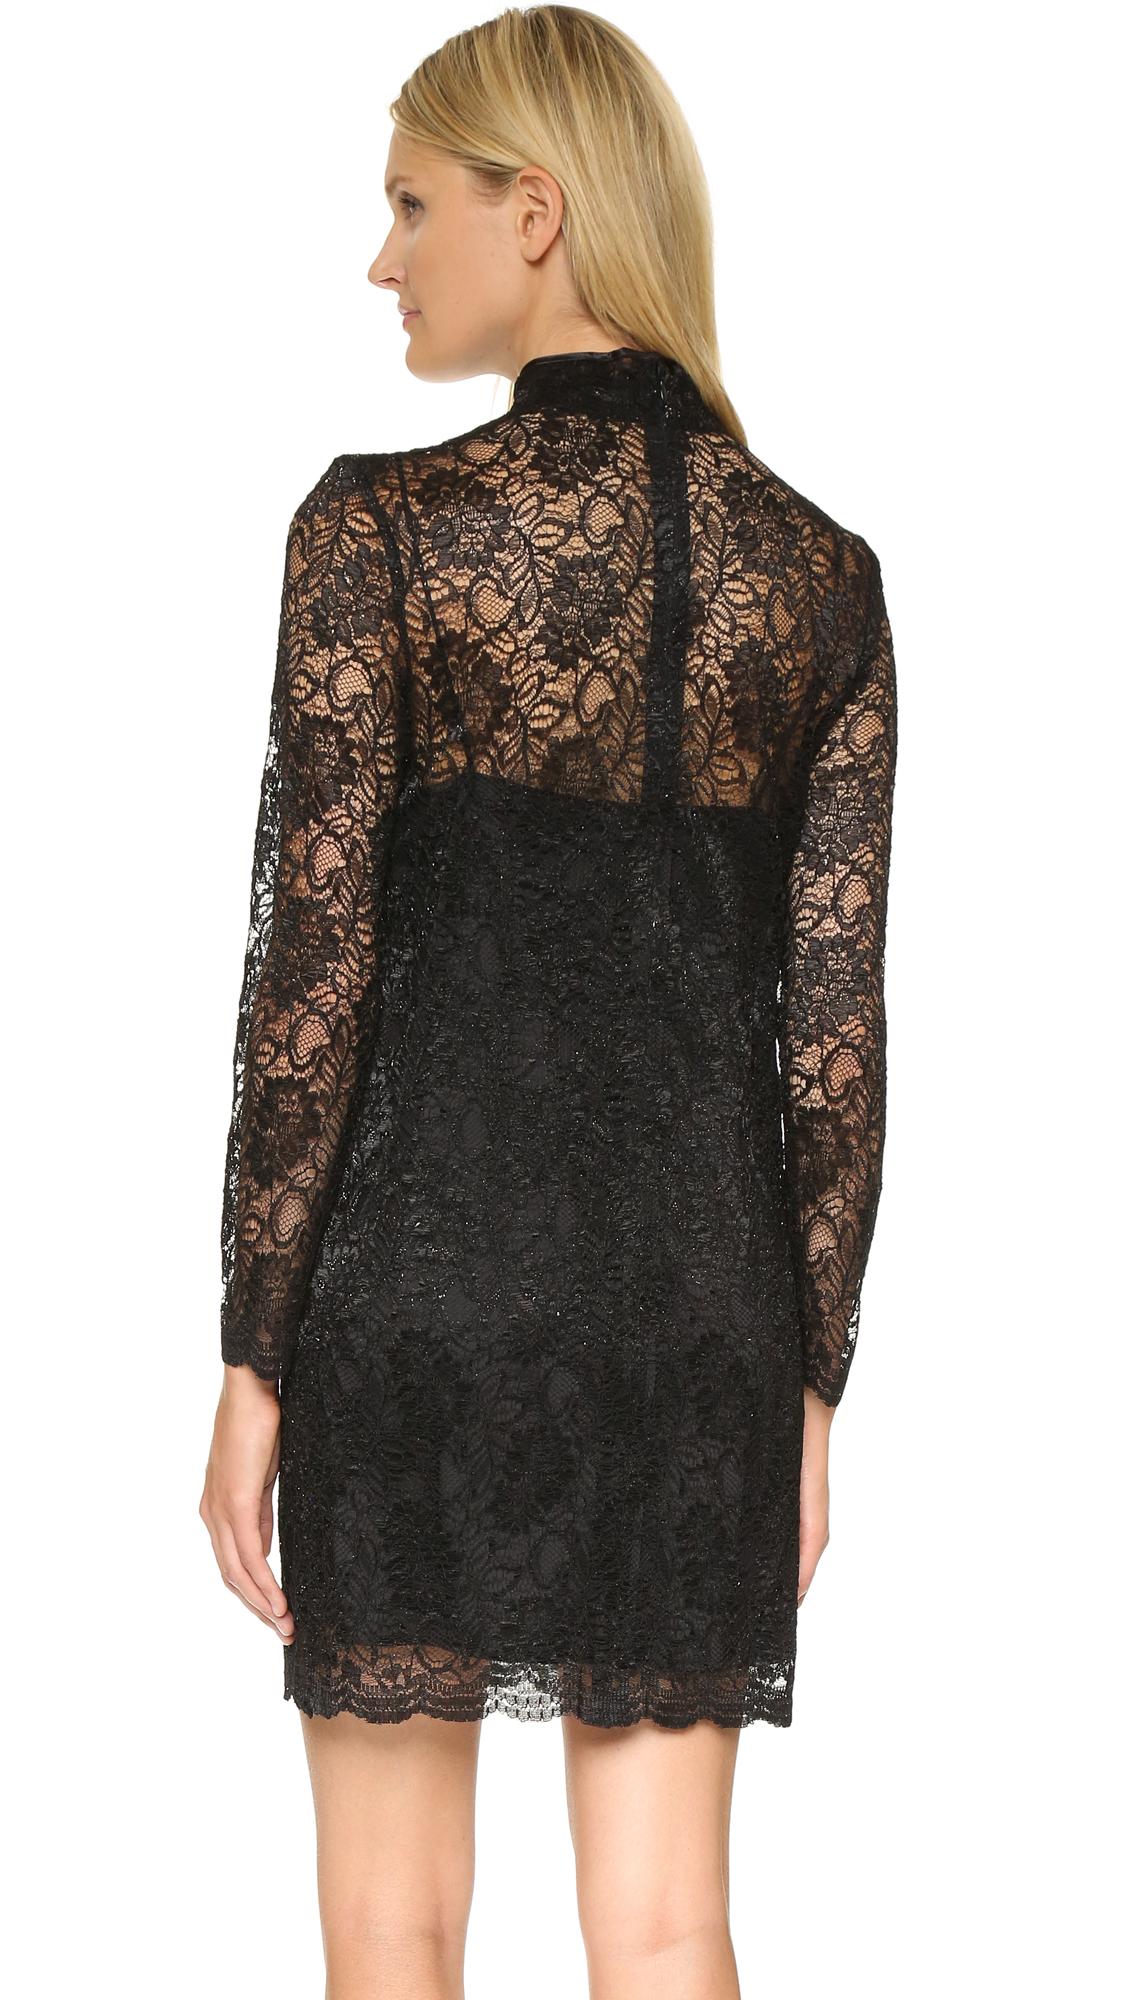 bcd6f41de2b The Kooples Lace Dress | SHOPBOP